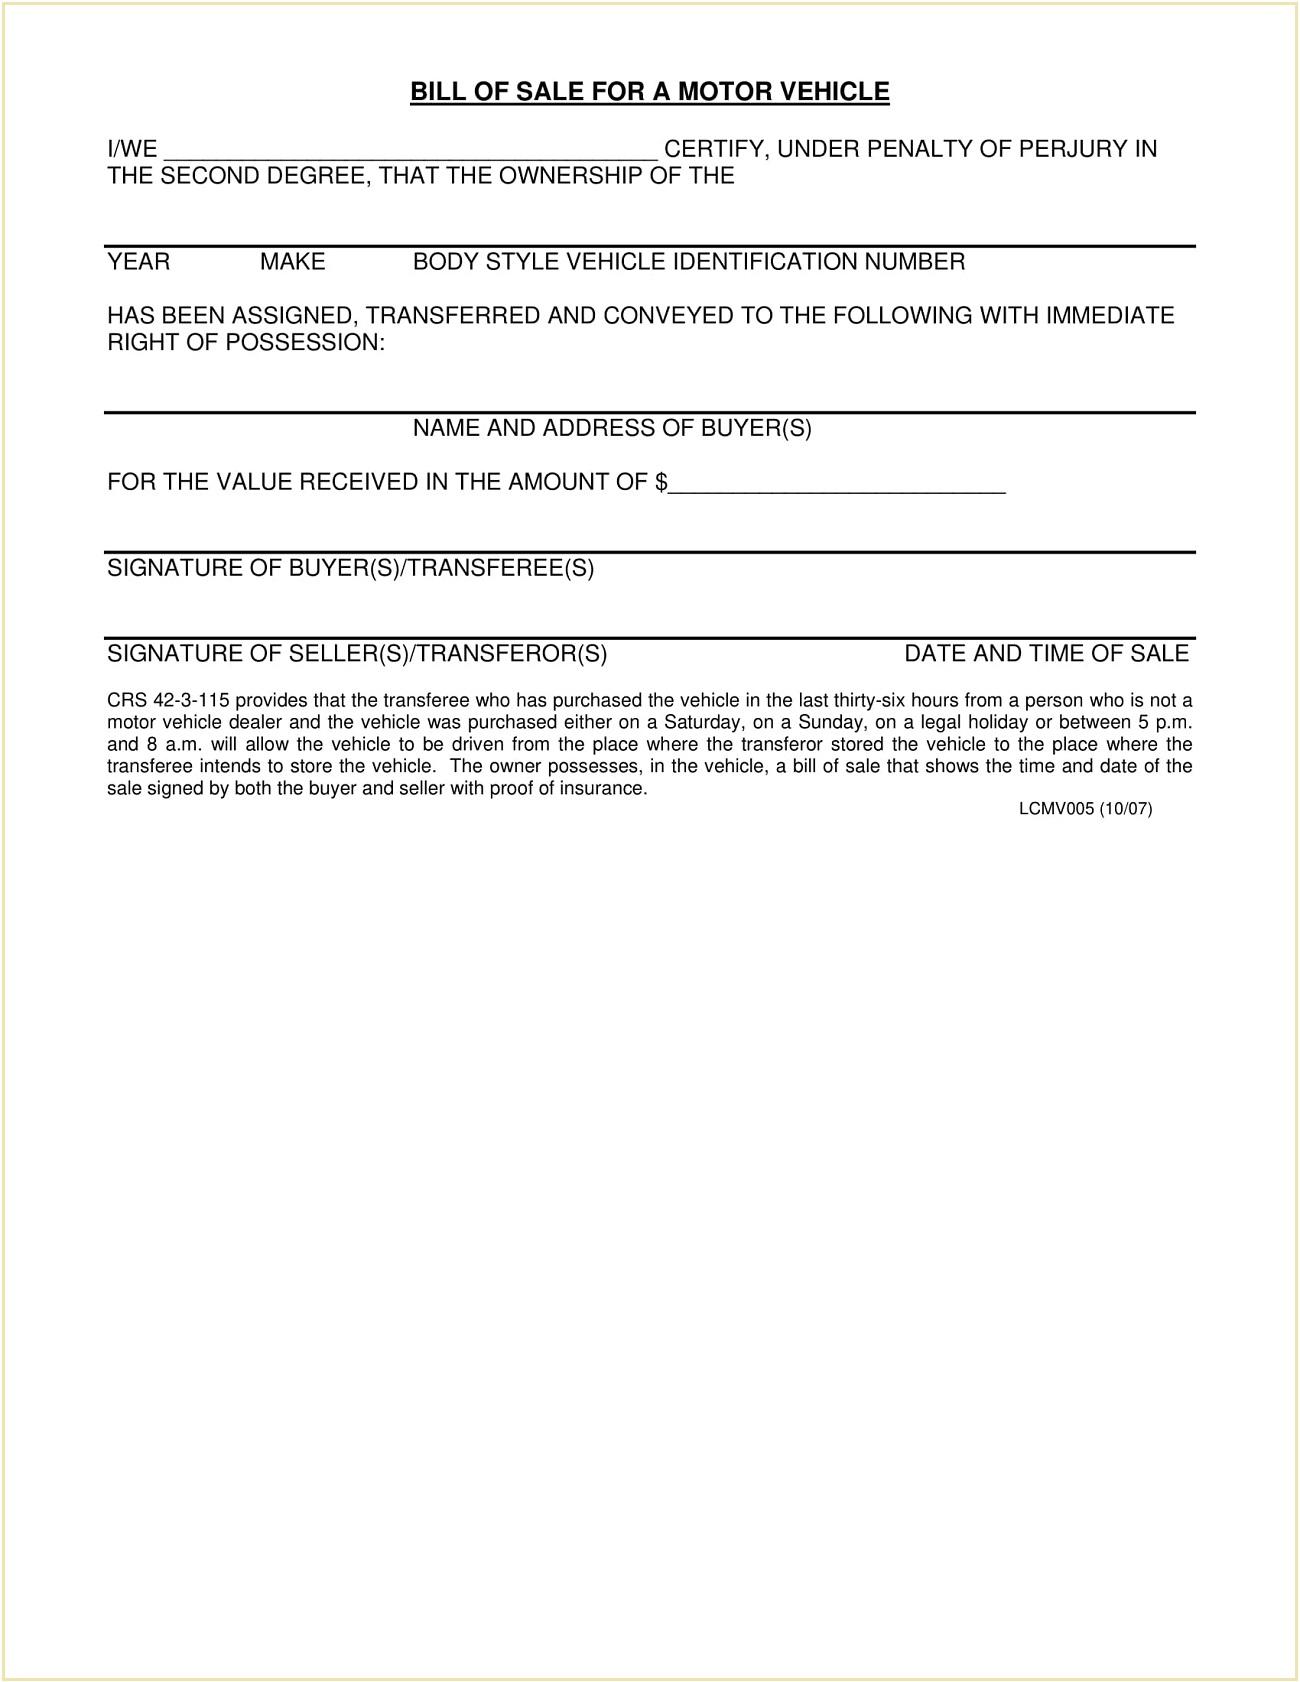 Larimer County Colorado DMV Motor Vehicle Bill of Sale Form PDF